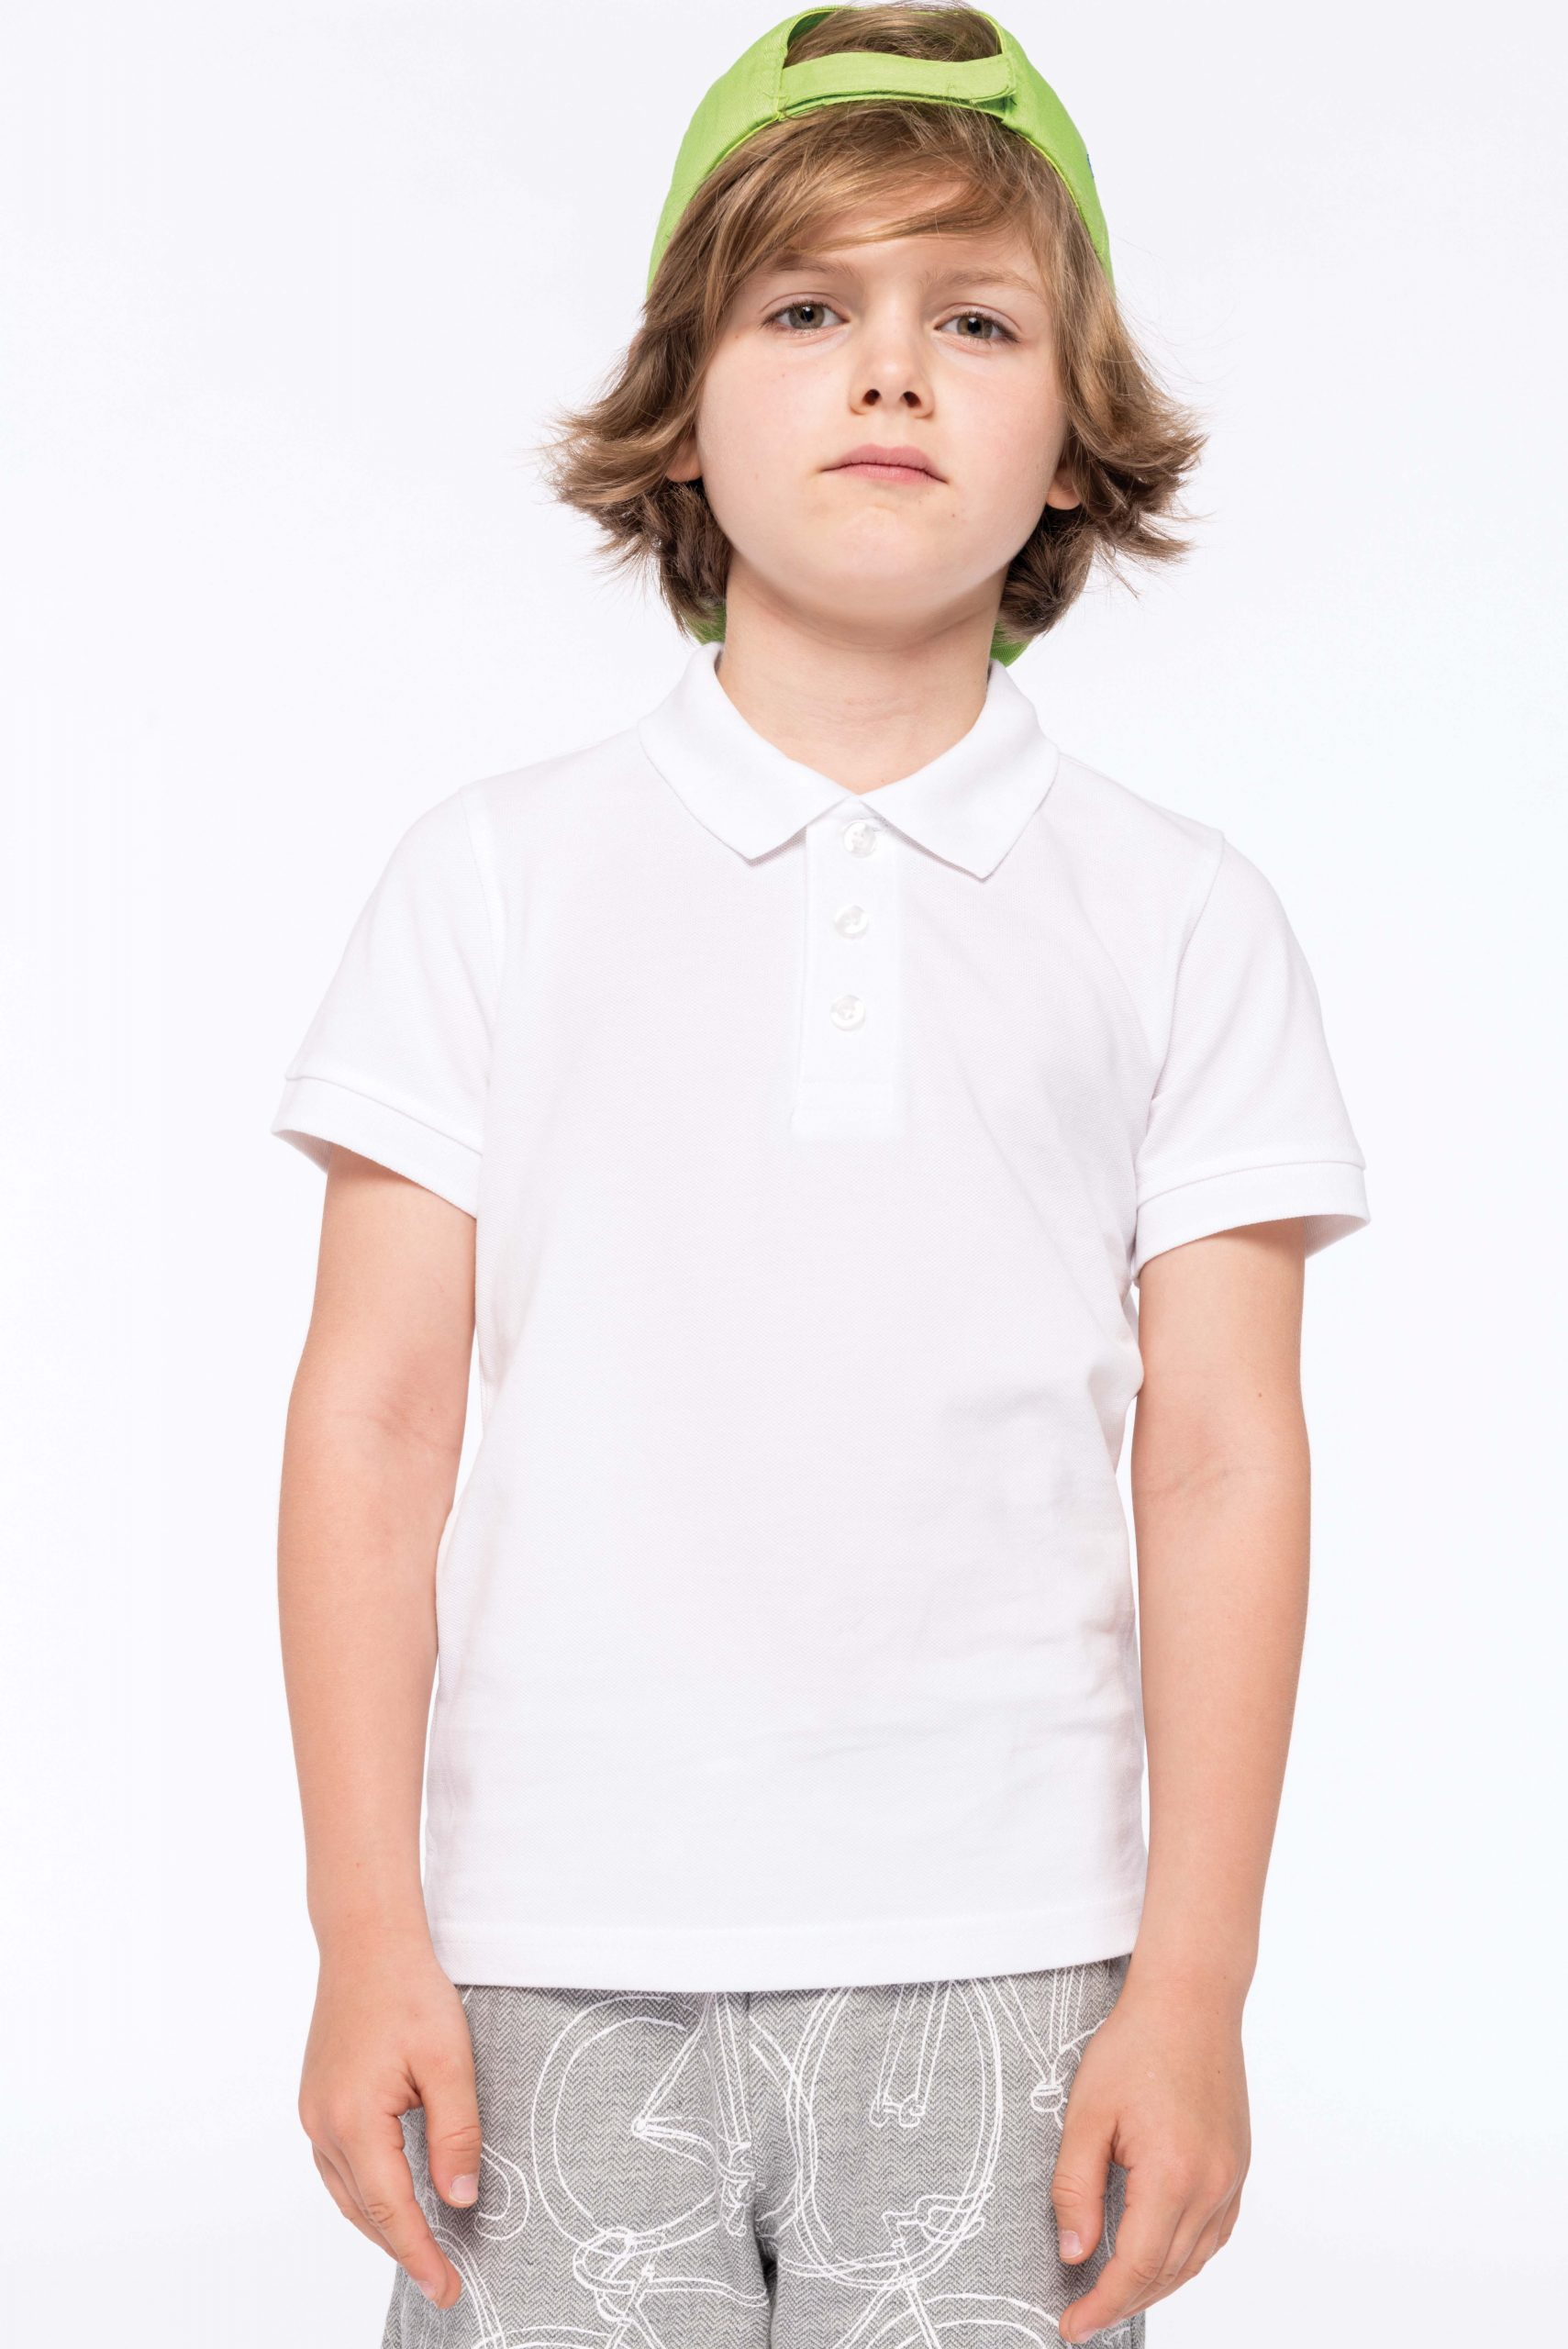 Short Sleeves Poloshirt Kids